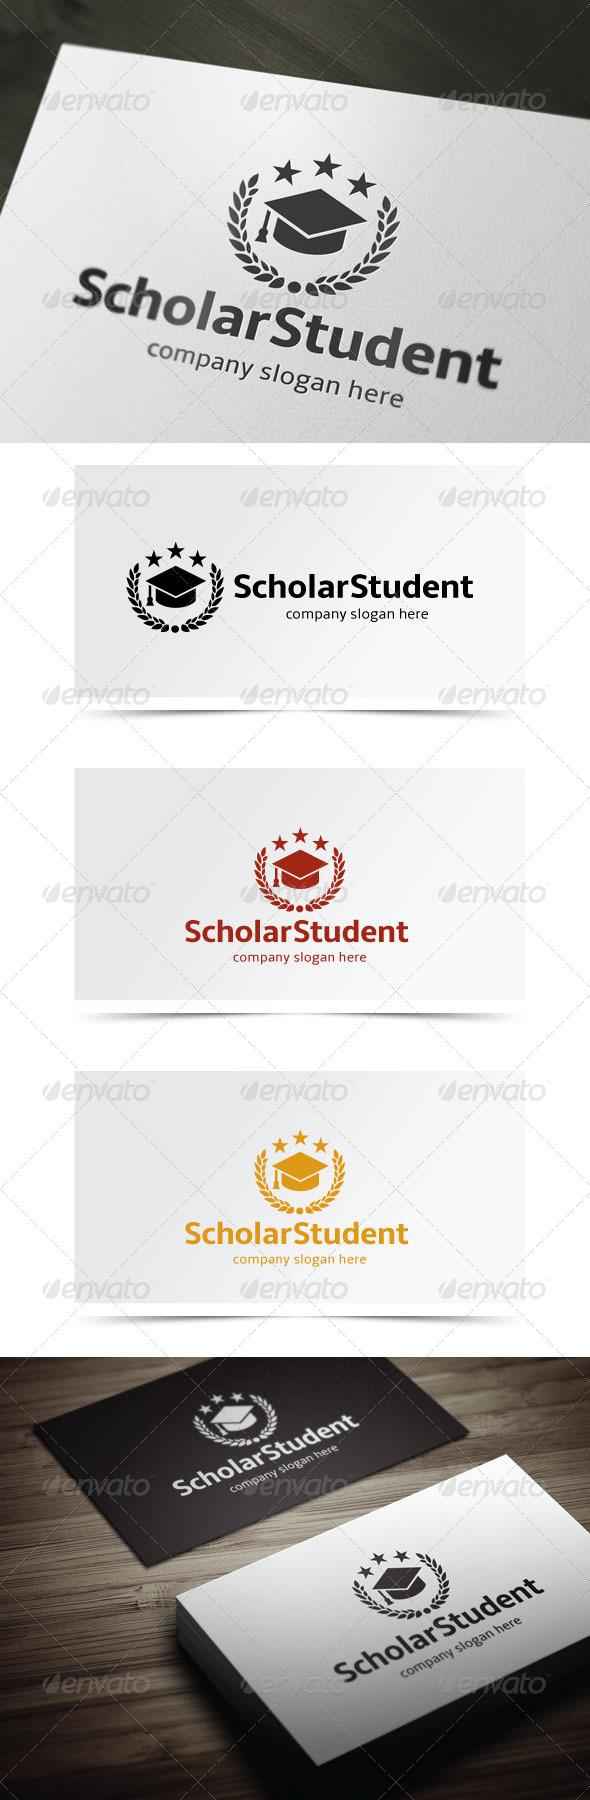 GraphicRiver Scholar Student 5572338